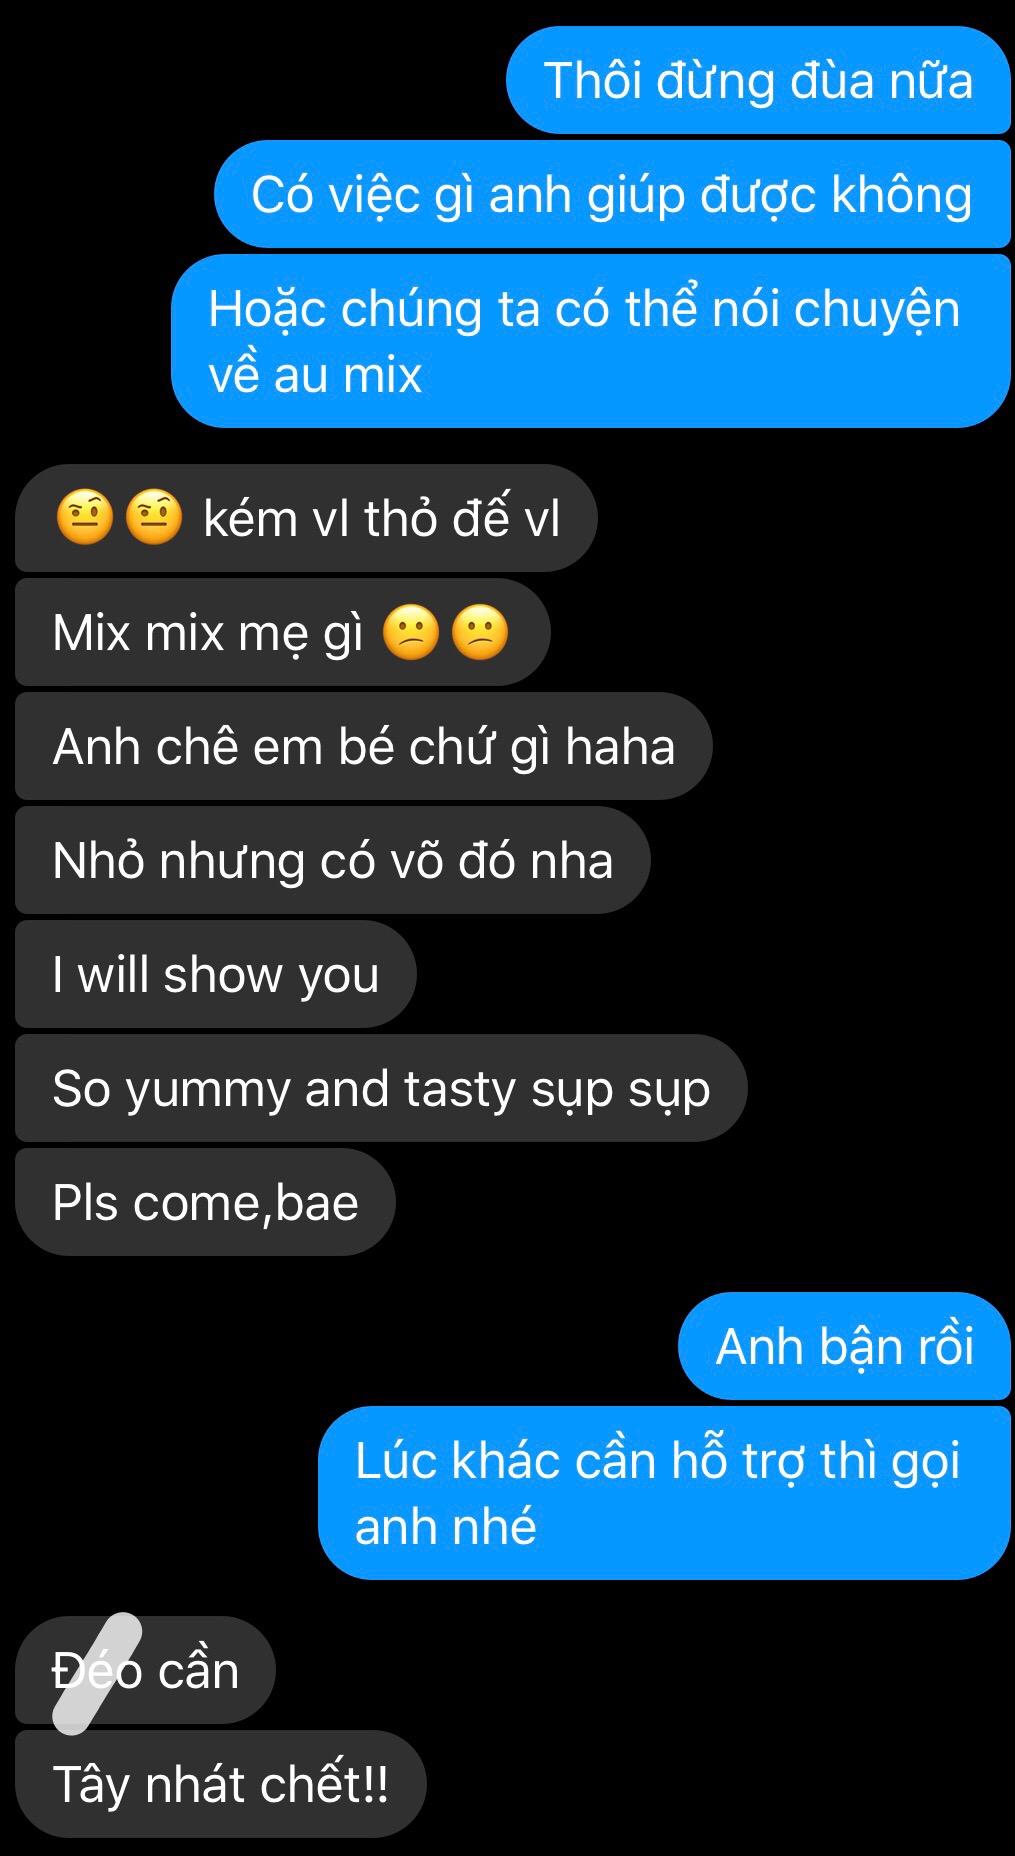 Admin trai tây của Au Mix Mobile bị em gái 2K gạ gẫm 6